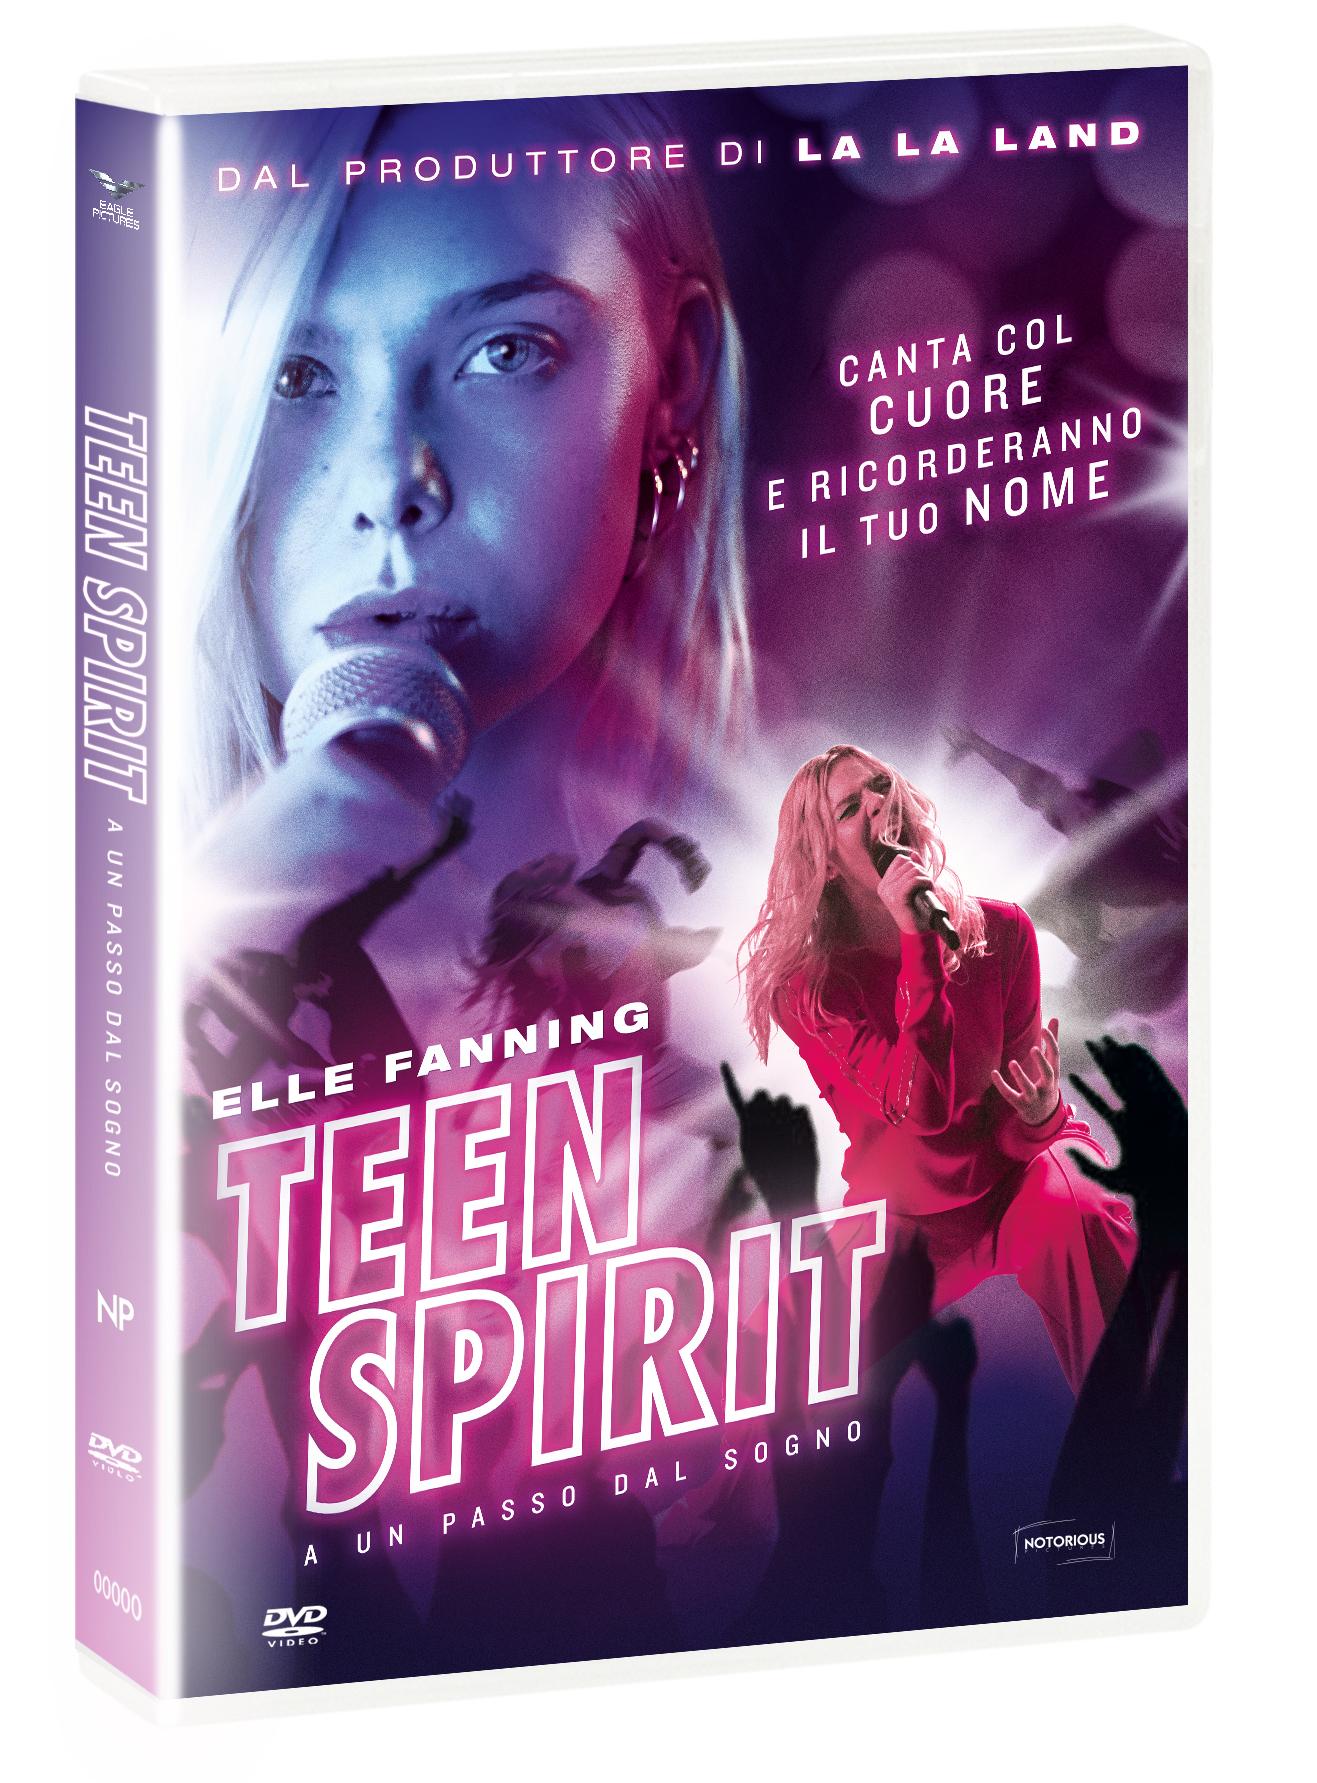 TEEN SPIRIT - A UN PASSO DAL SOGNO (DVD)